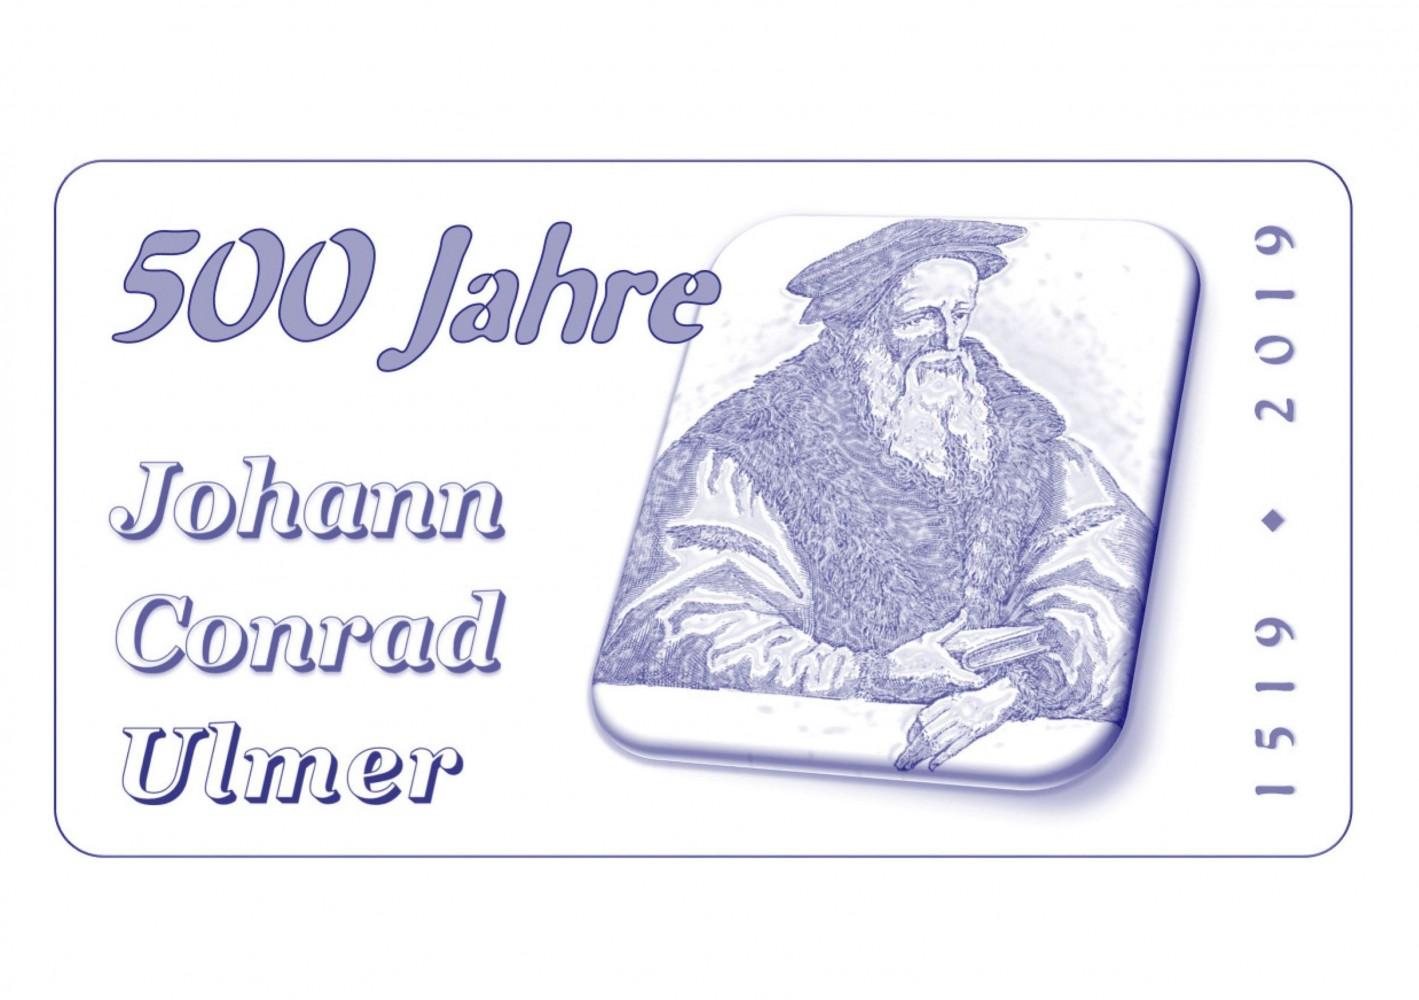 Johann Conrad Ulmer - Logo